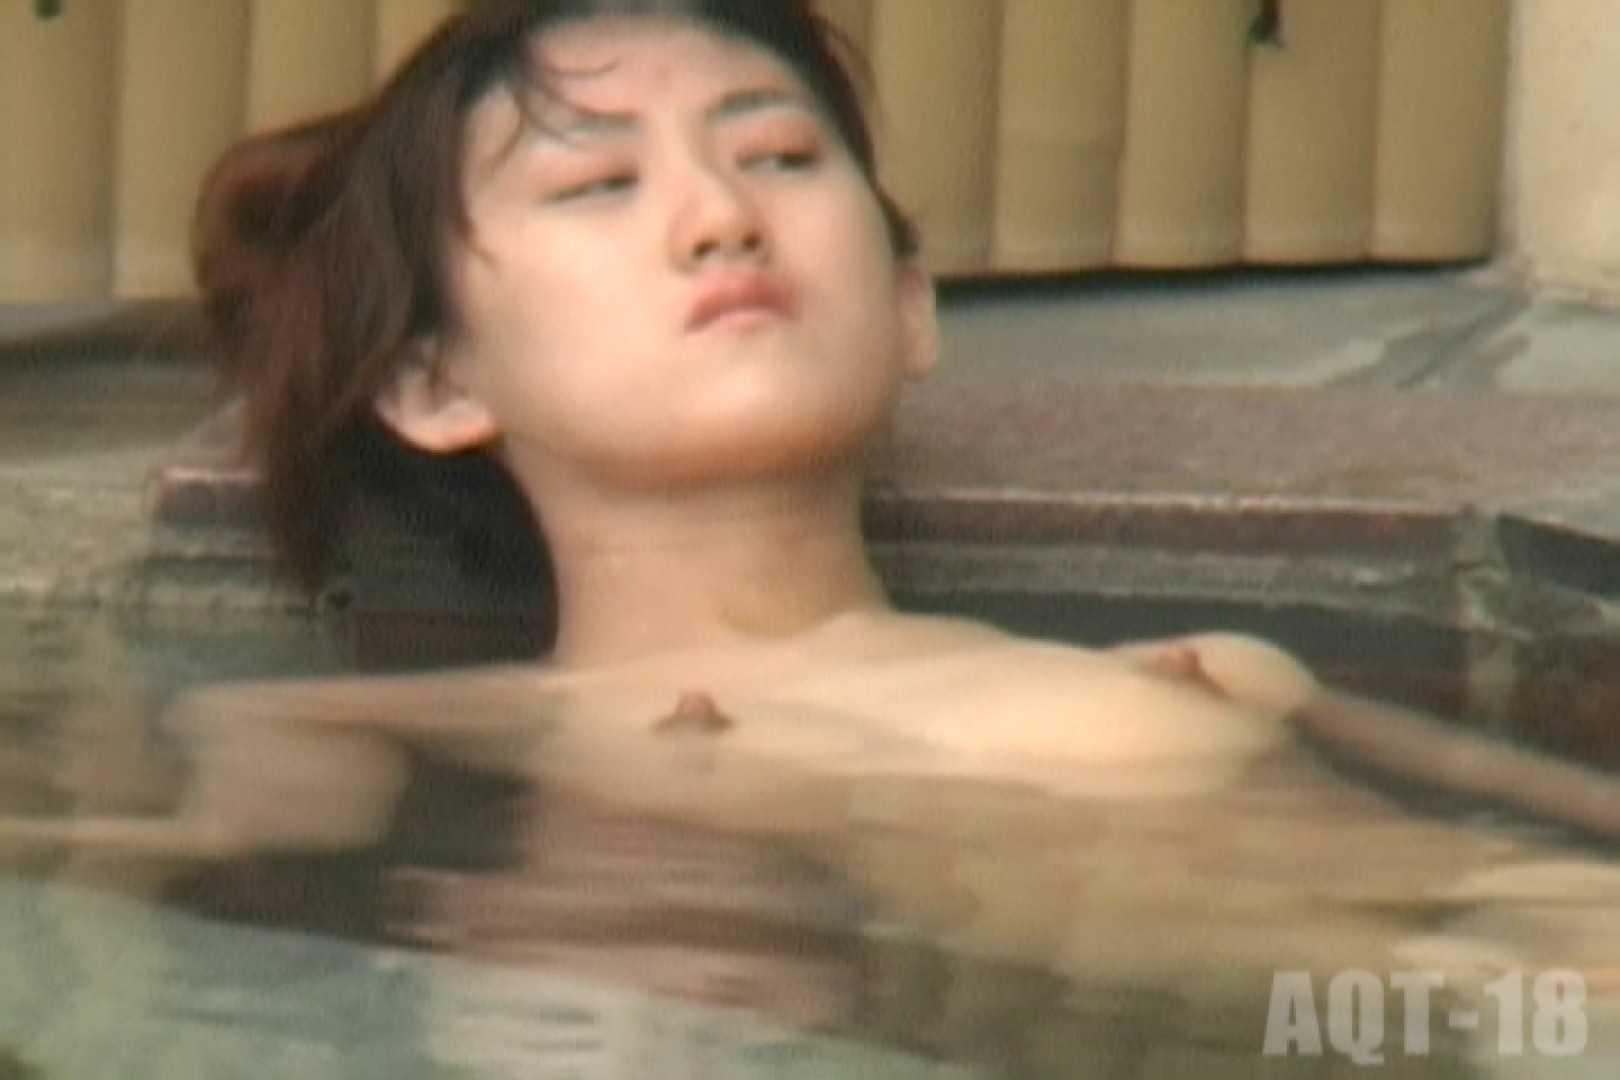 Aquaな露天風呂Vol.862 美しいOLの裸体 戯れ無修正画像 99pic 56